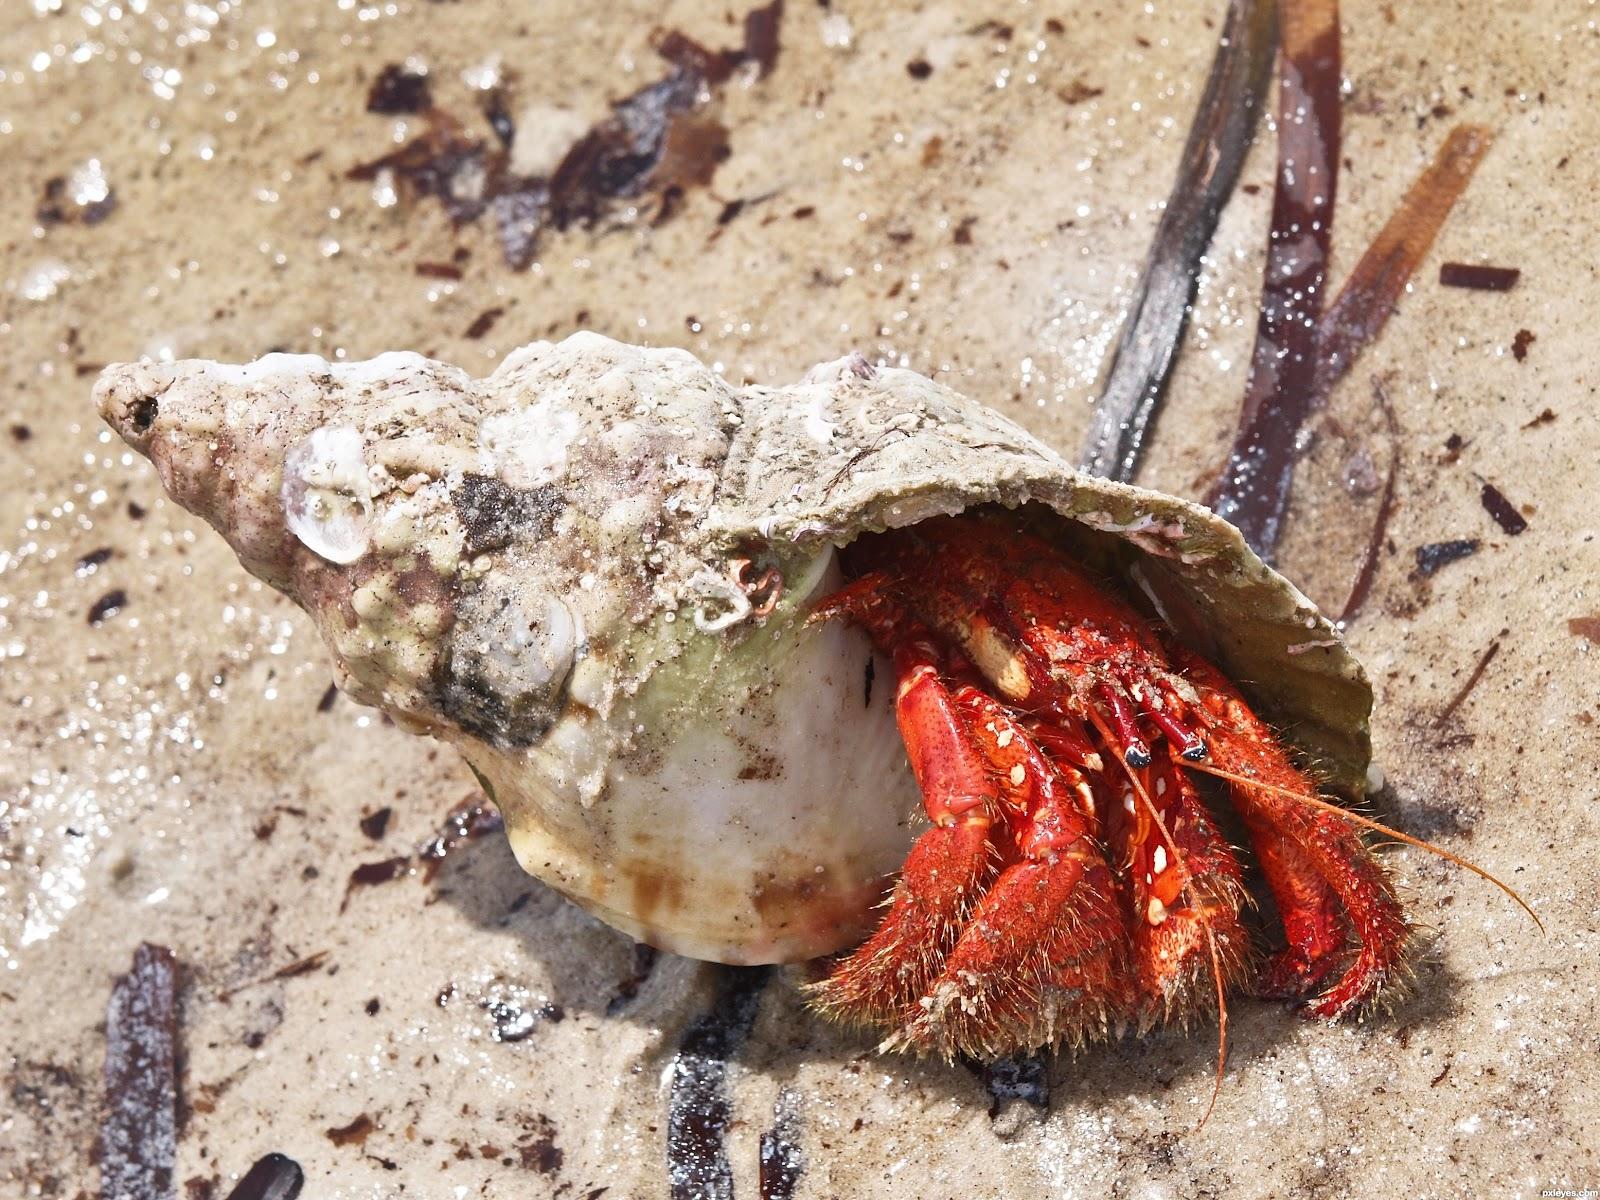 Hermit Crab | The Life of Animals